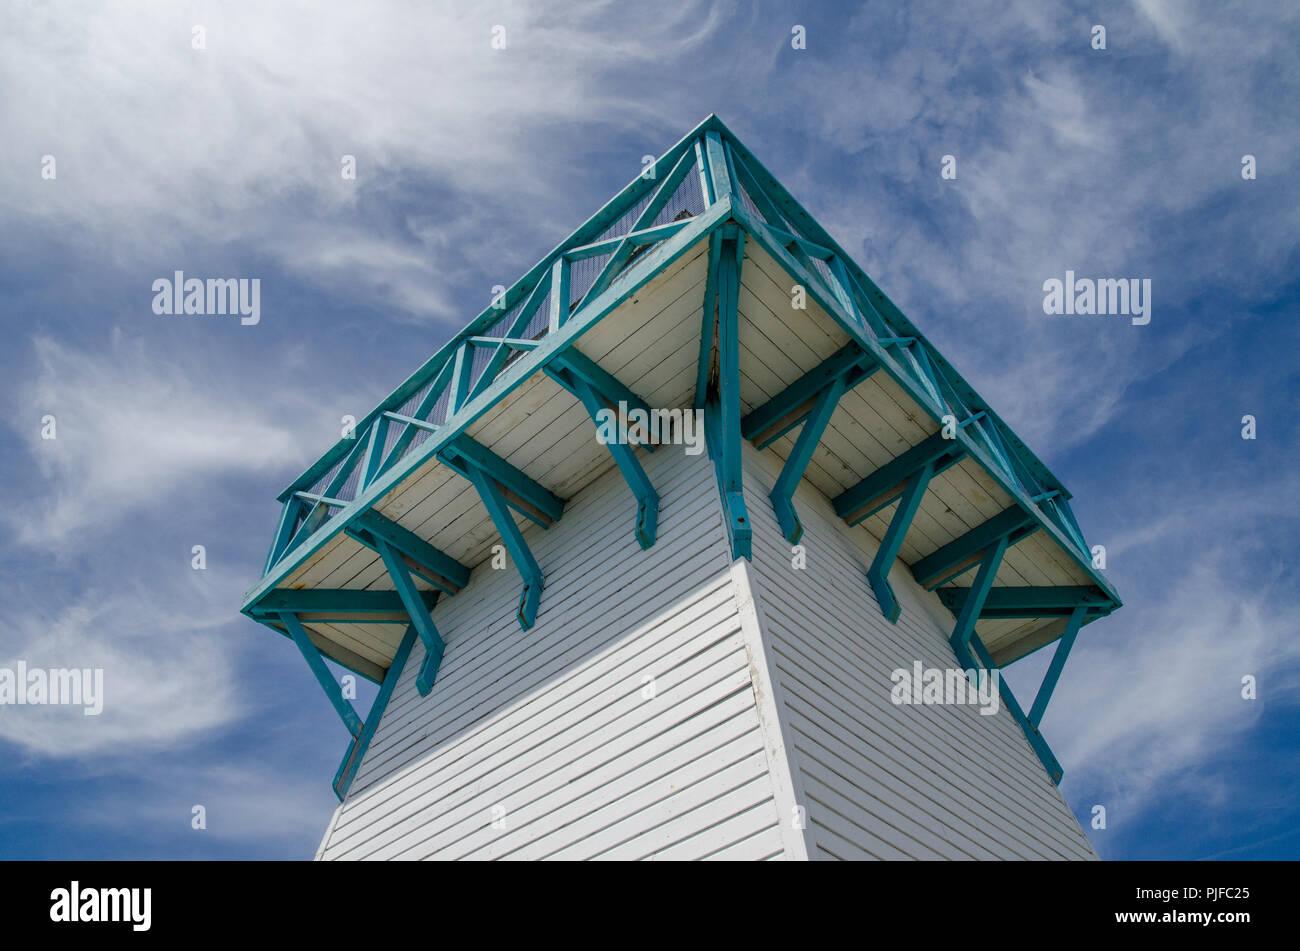 Lighthouse at Summerside seaside market. - Stock Image